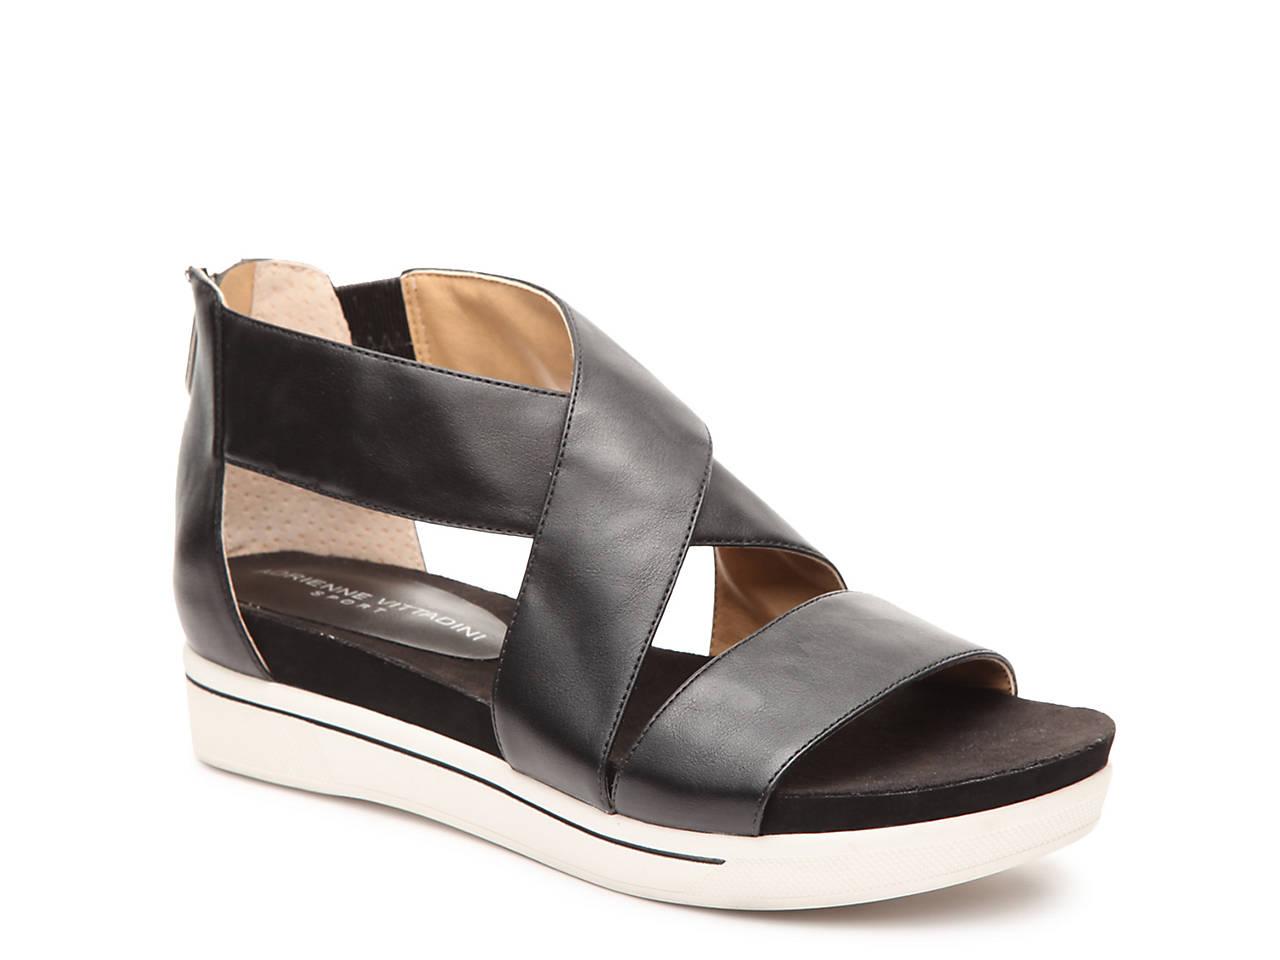 1f5c5a03508 Adrienne Vittadini Claud Gladiator Sandal Women s Shoes